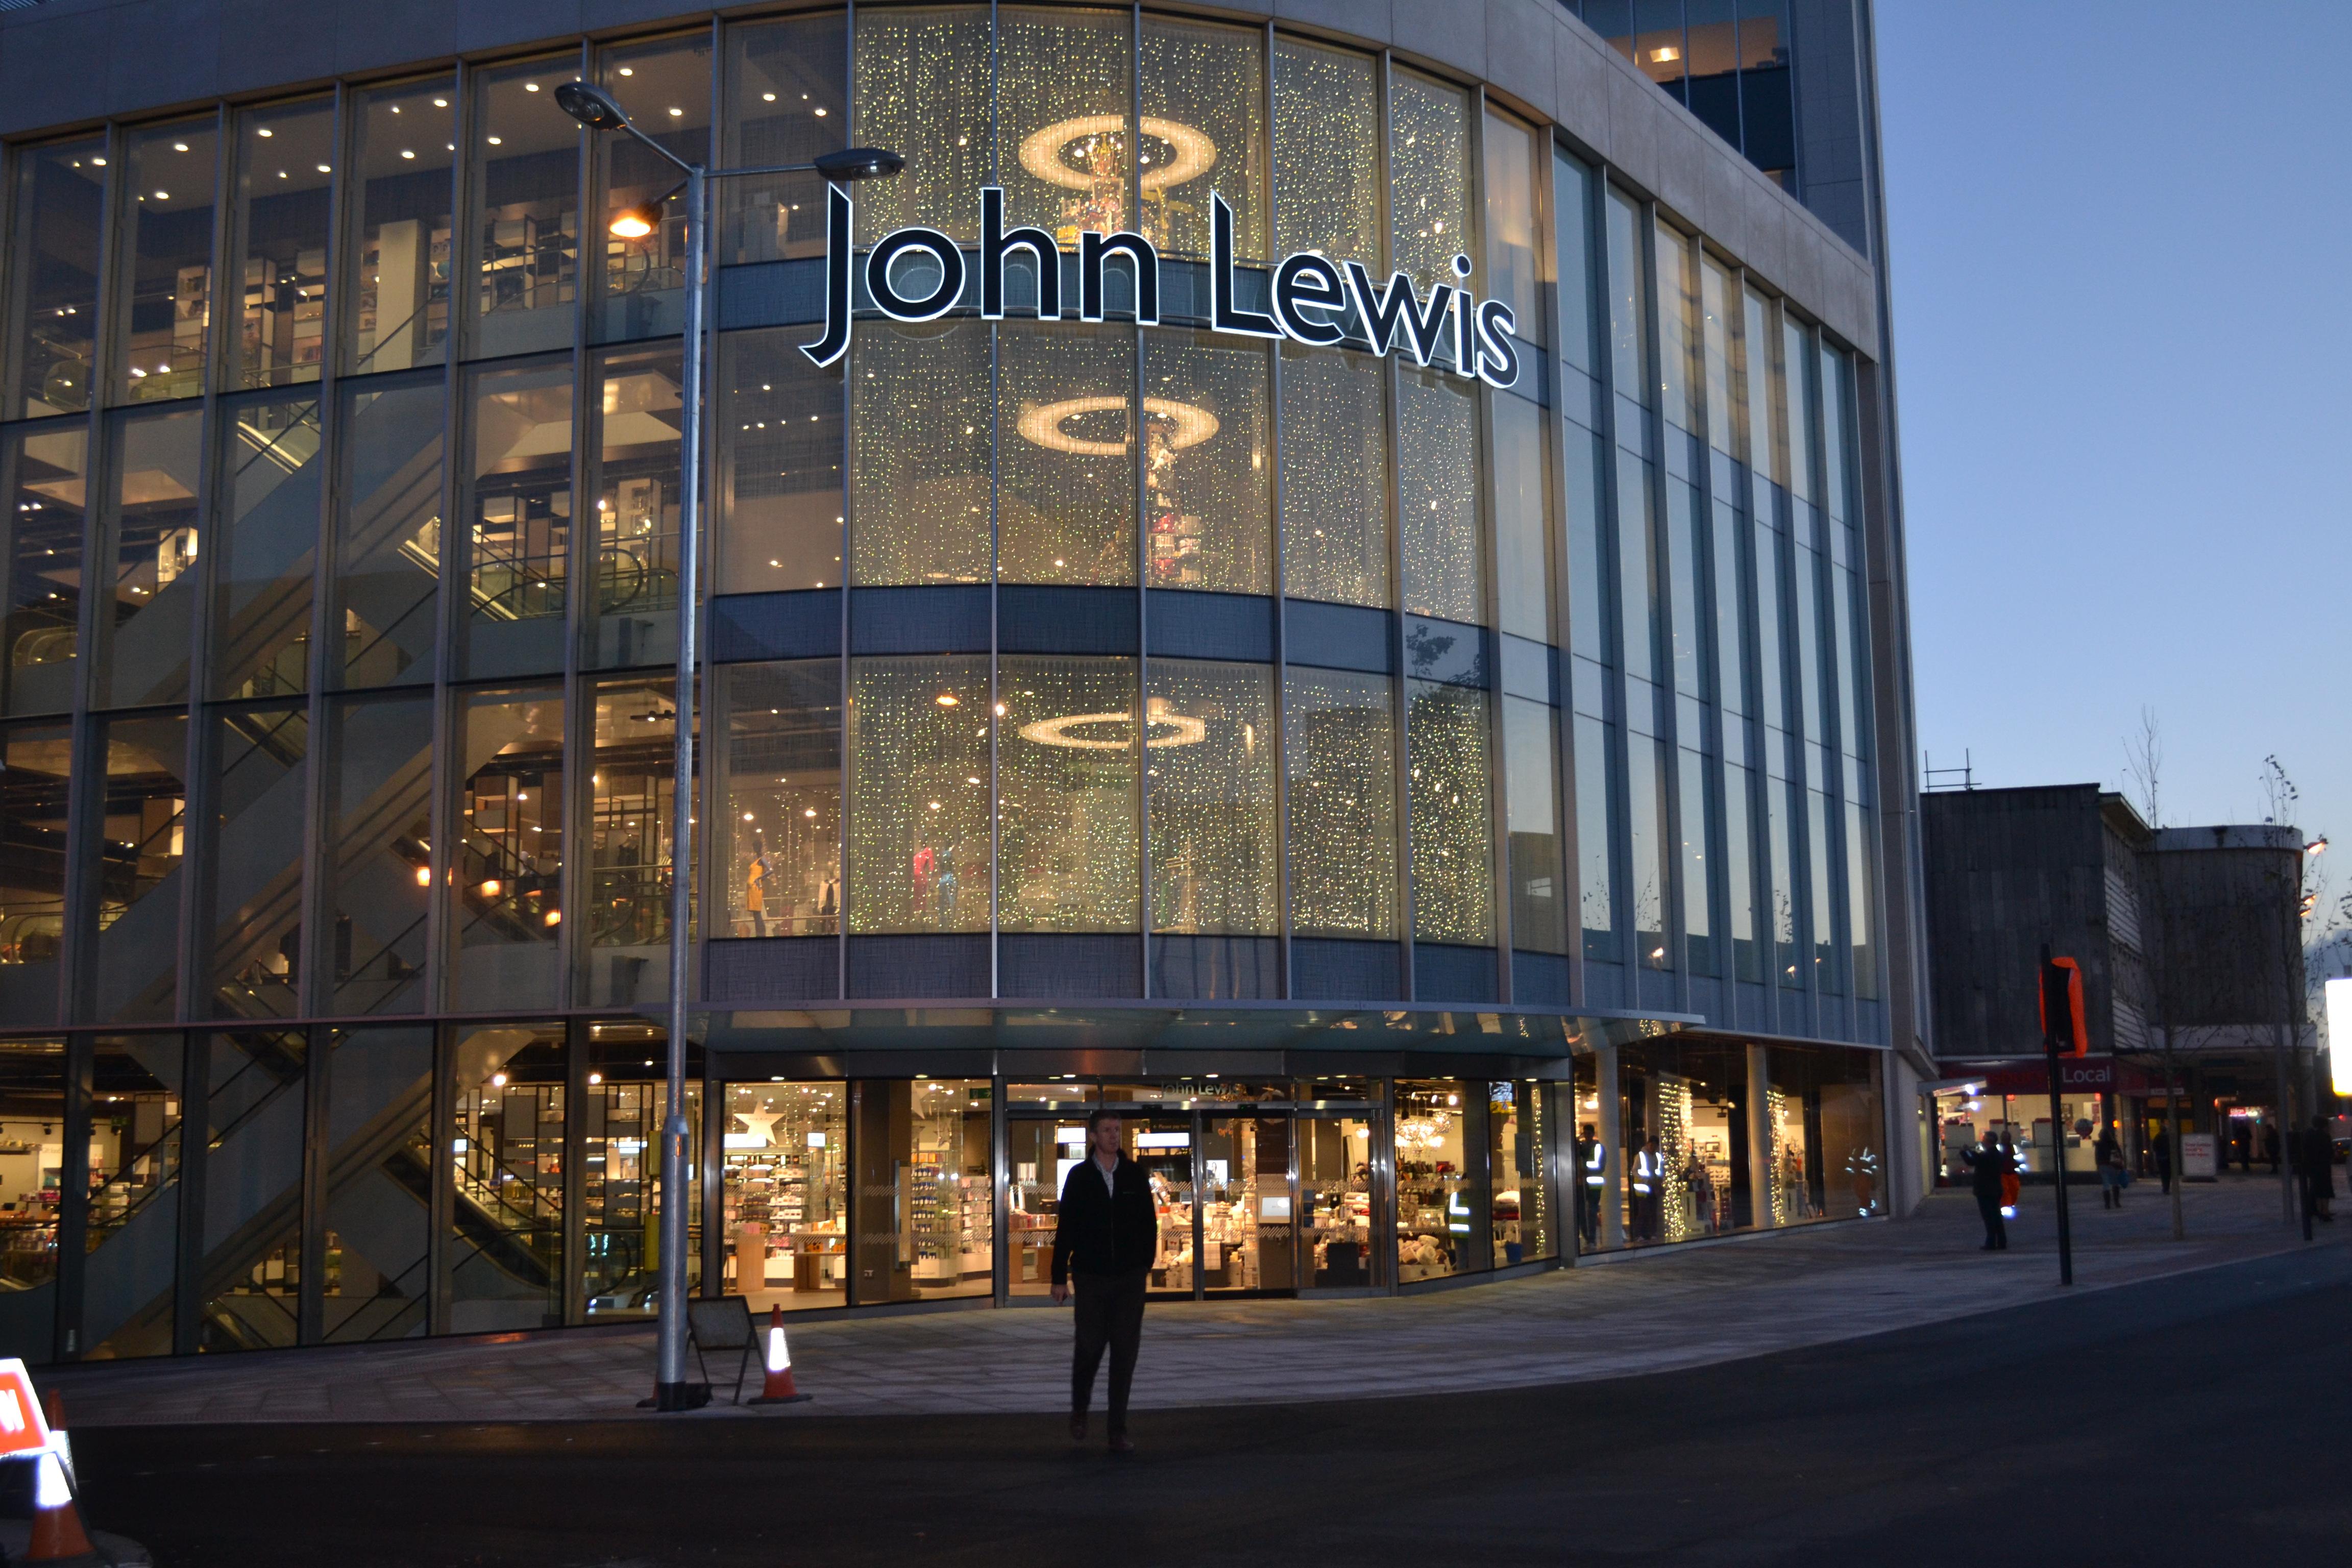 National newspaper praises John Lewis joint effort | The ...